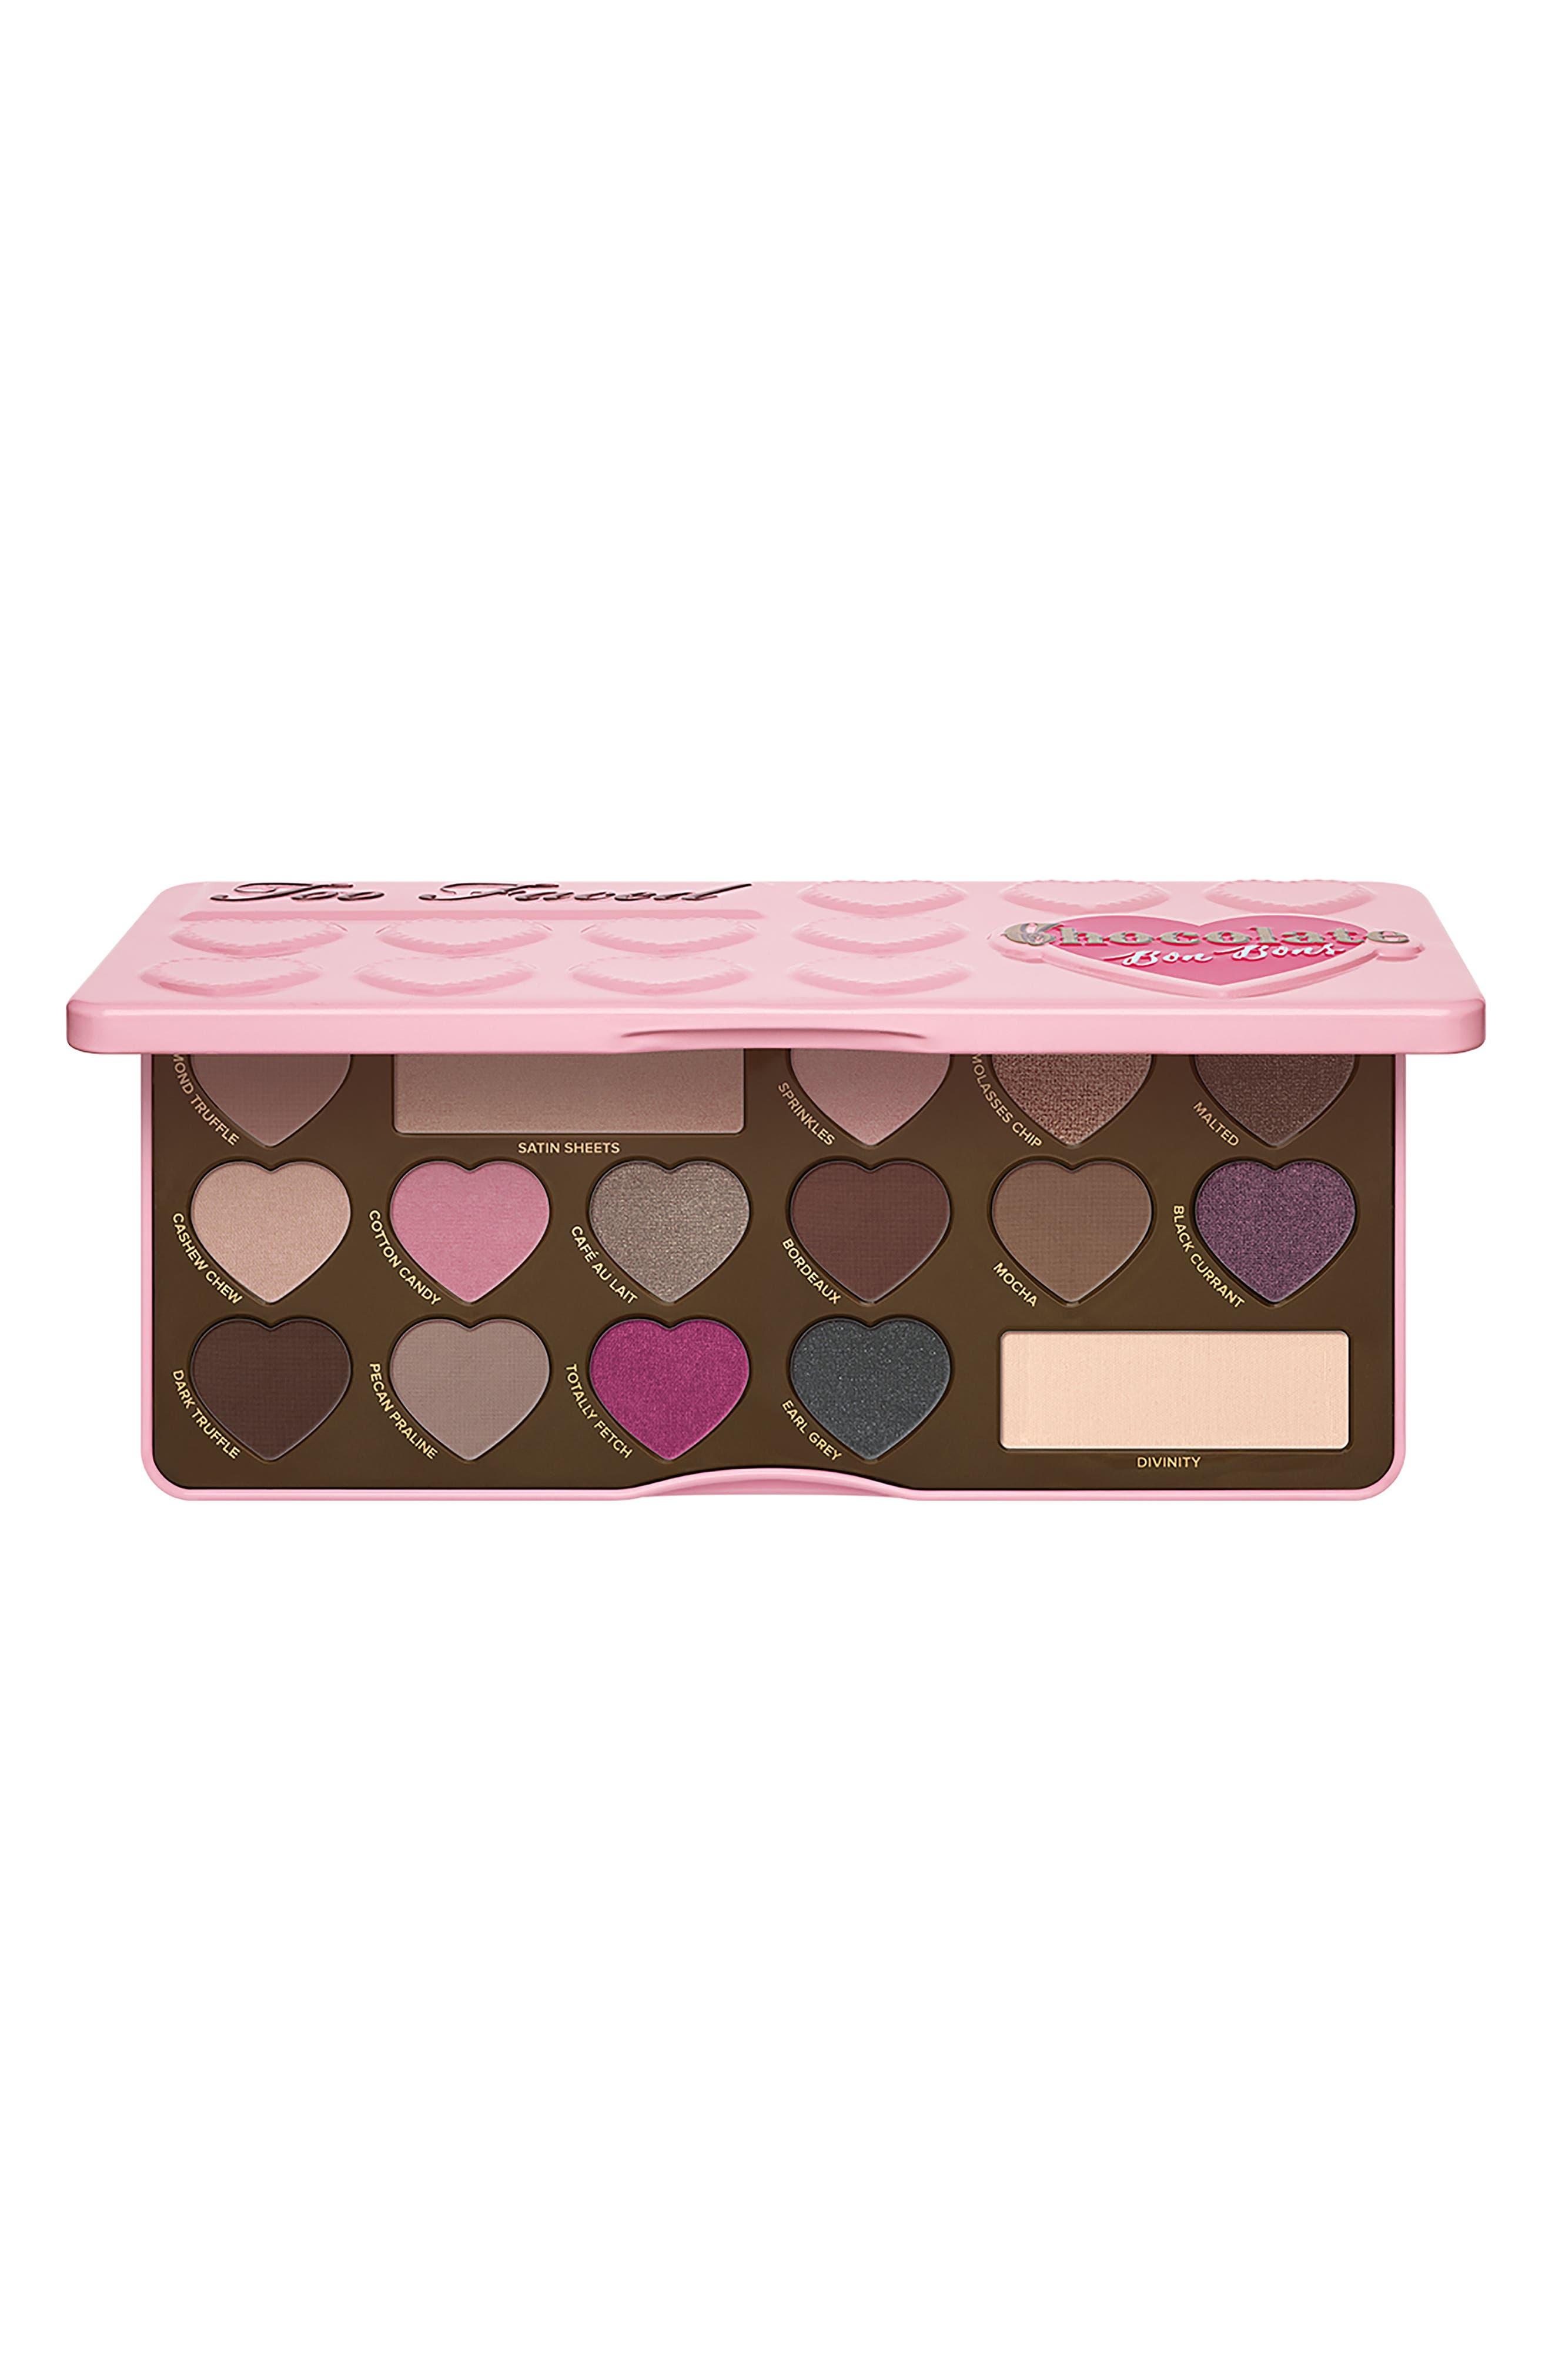 Chocolate Bon Bons Eyeshadow Palette,                             Main thumbnail 1, color,                             No Color